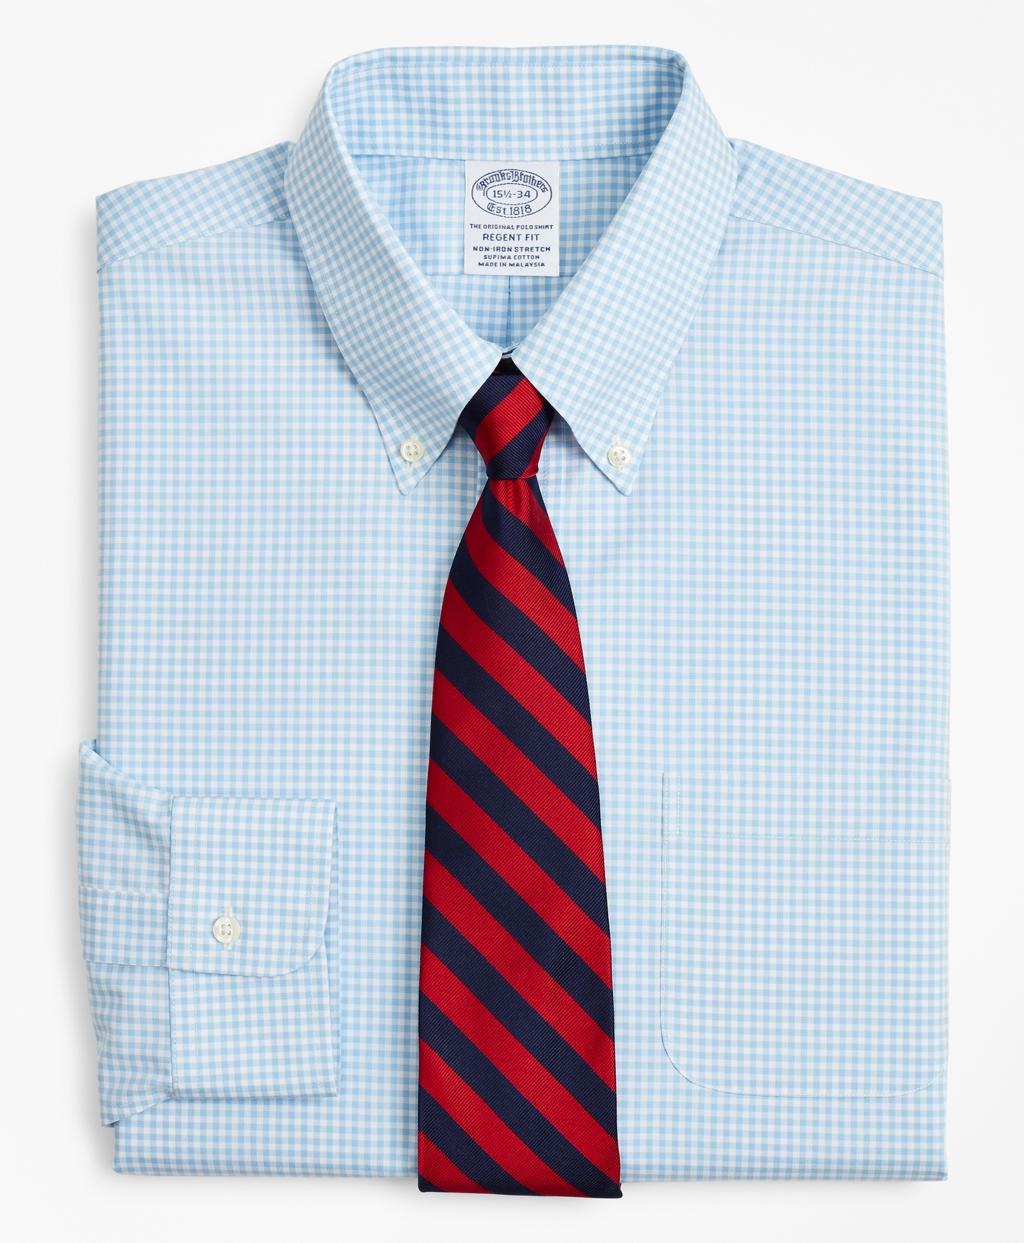 Brooksbrothers Stretch Regent Regular-Fit Dress Shirt, Non-Iron Poplin Button-Down Collar Gingham